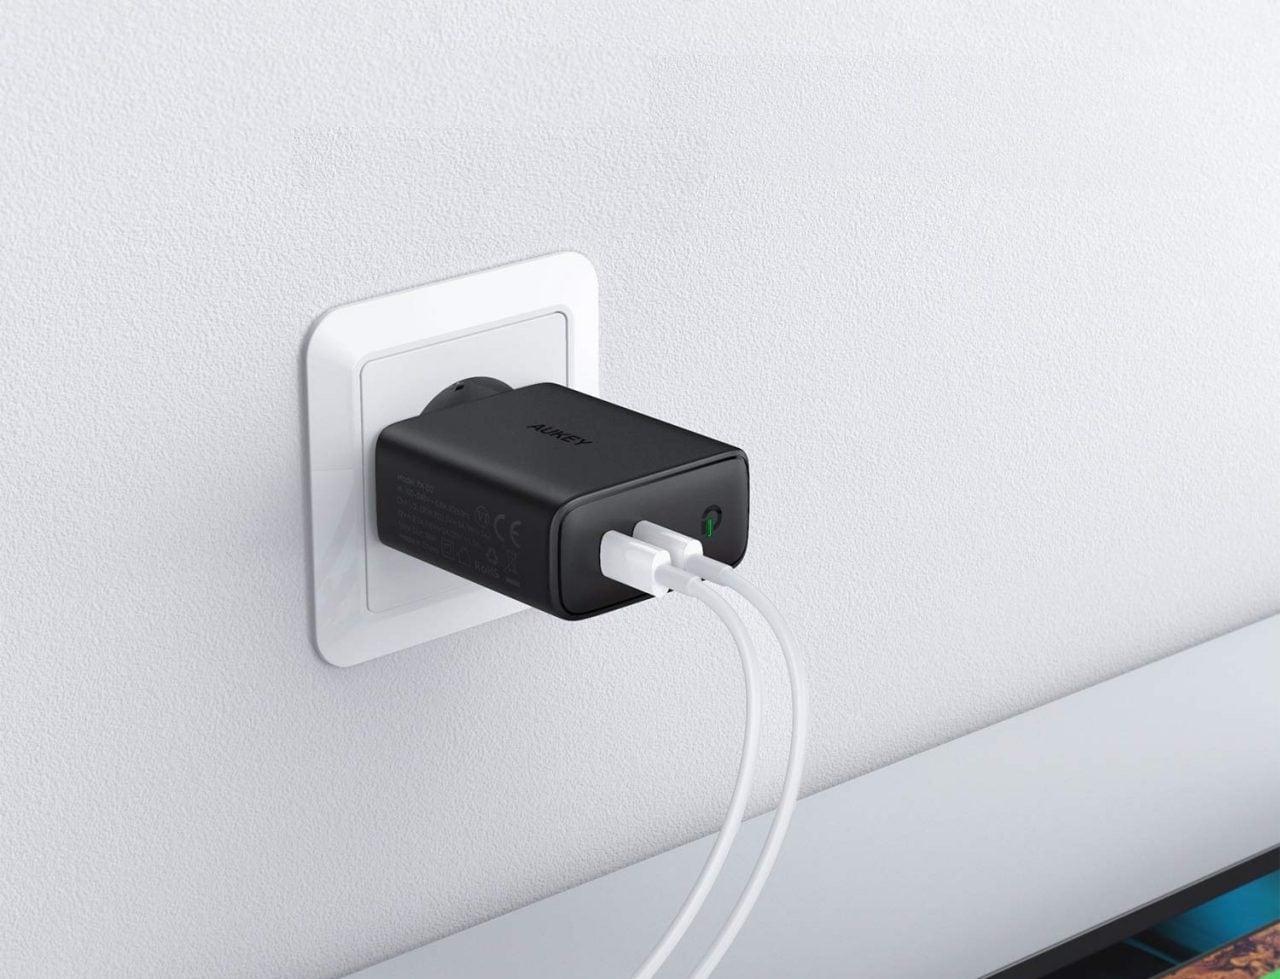 Alimentatore 61w USB-C Power Adattatore tipo-C cavo di ricarica per Apple MacBook SAMSUNG LG